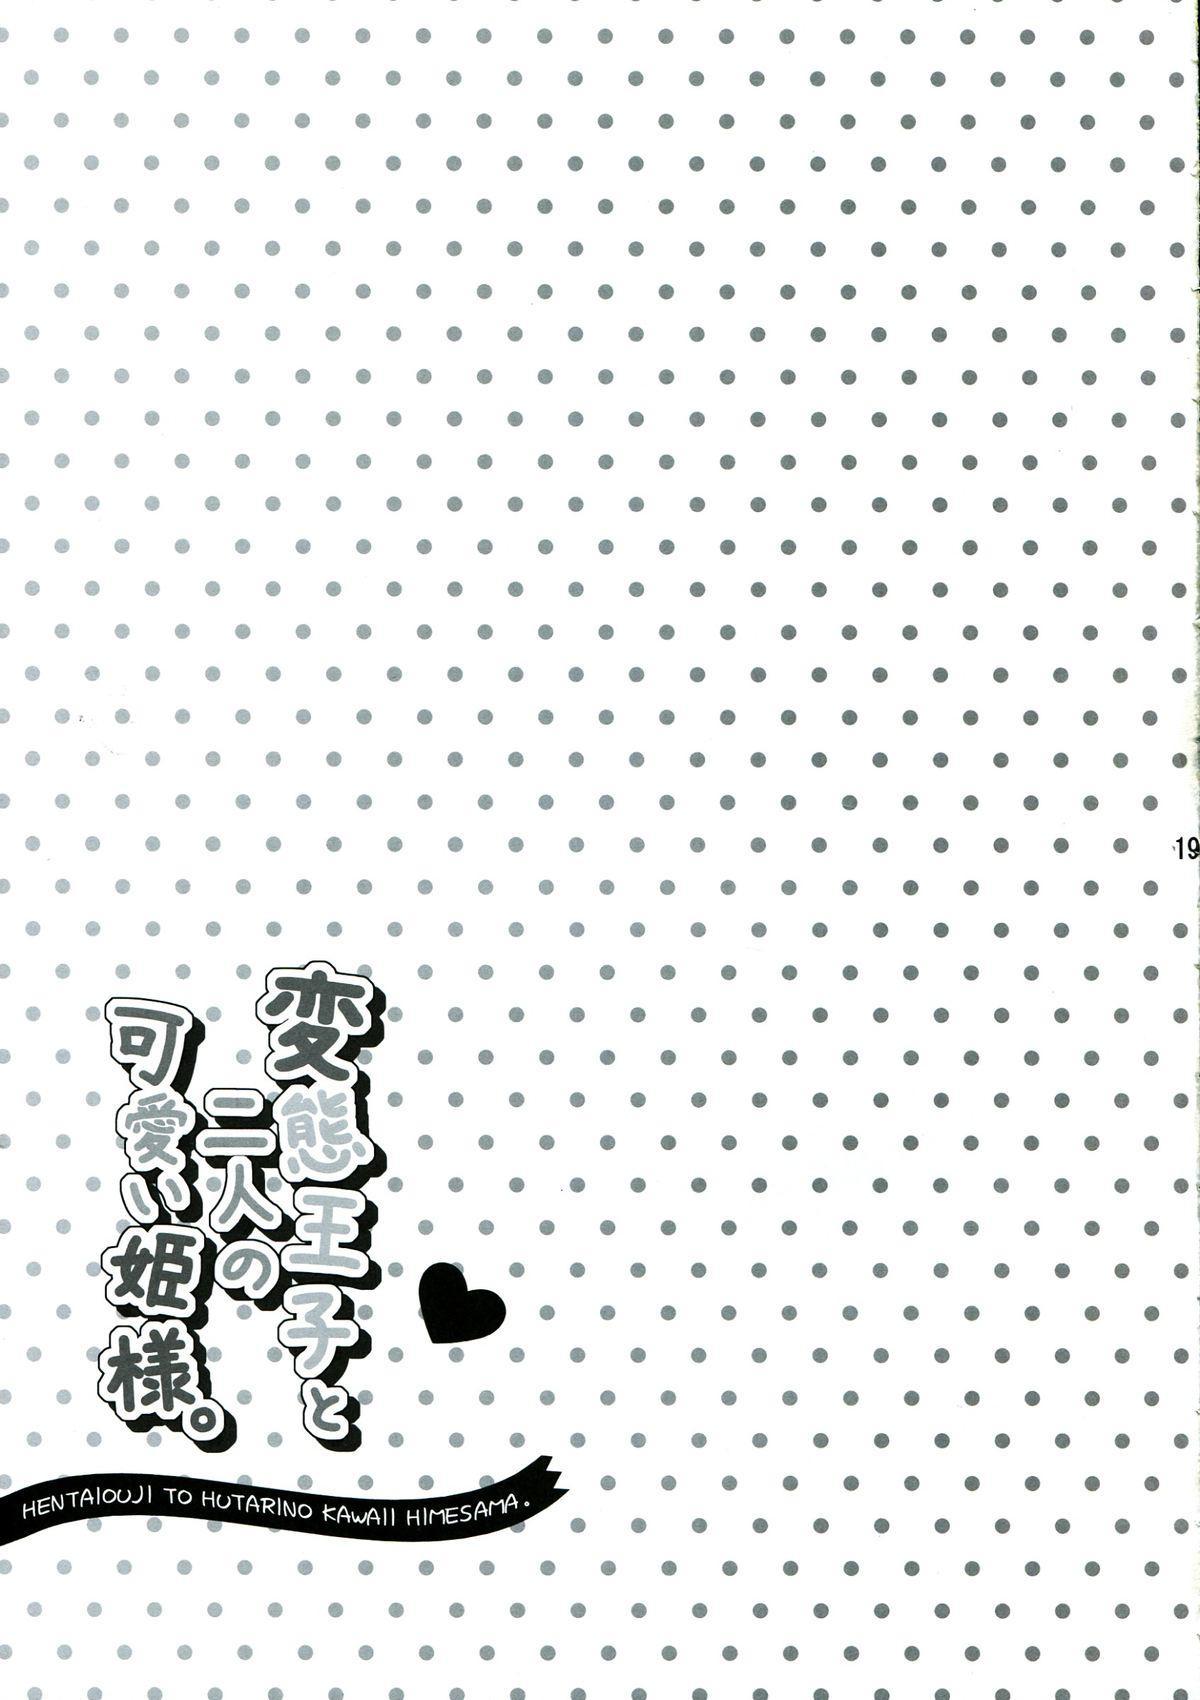 Hentai Ouji to Futari no Kawaii Hime-sama 18